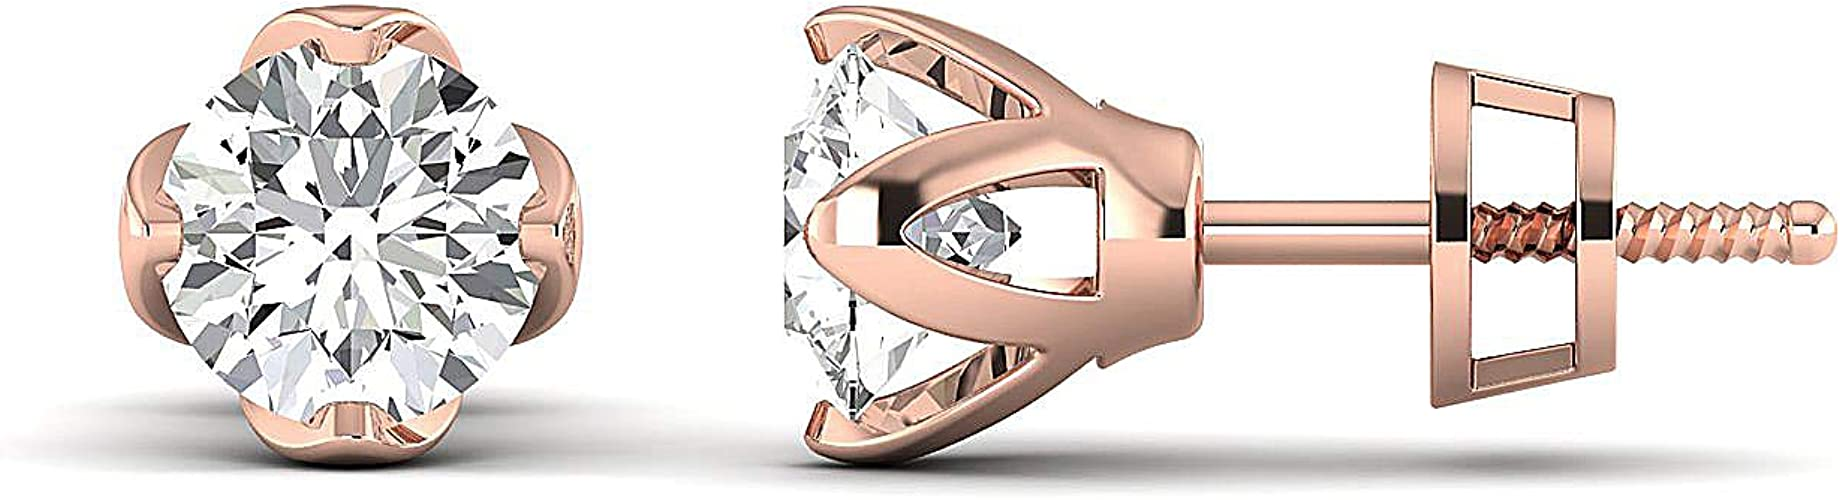 10k Rose Gold Prism Jewel 0.03CT G-H//I1 Natural Diamond Open Hexagon Shape Pendant